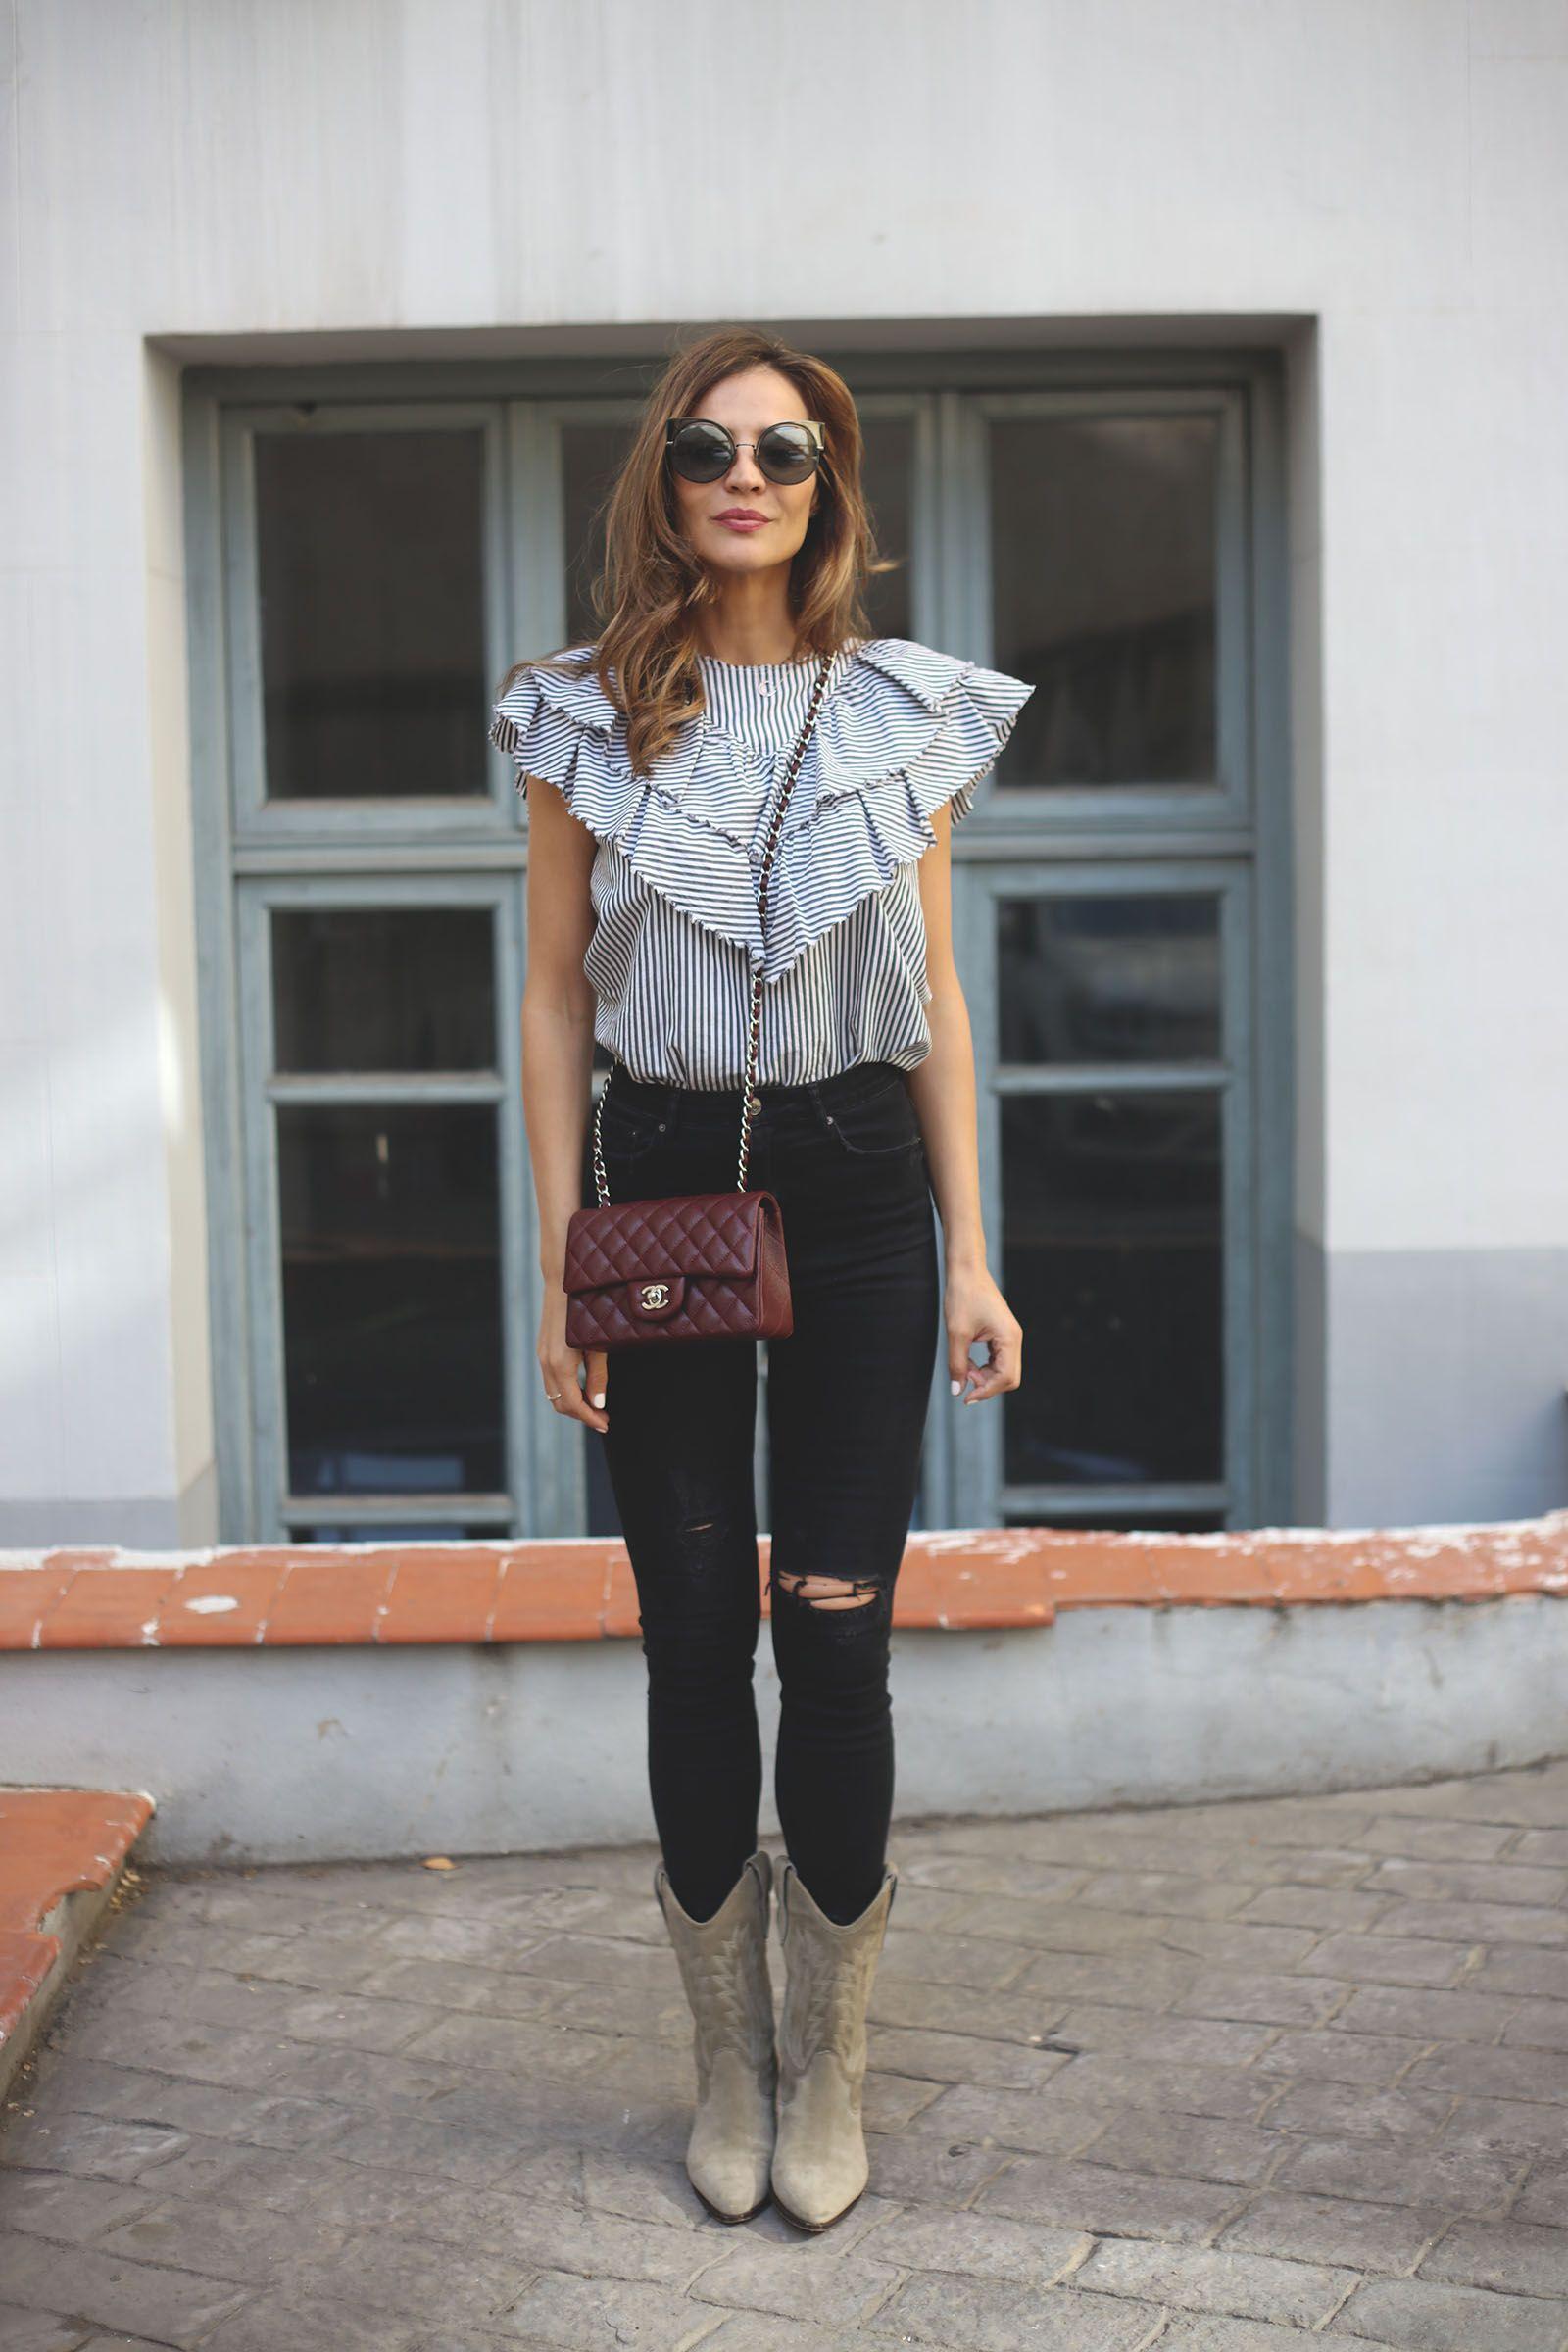 BotasBotas Striped Jeans Y Mujer Cowboy ShirtBlusas qSMpUVz